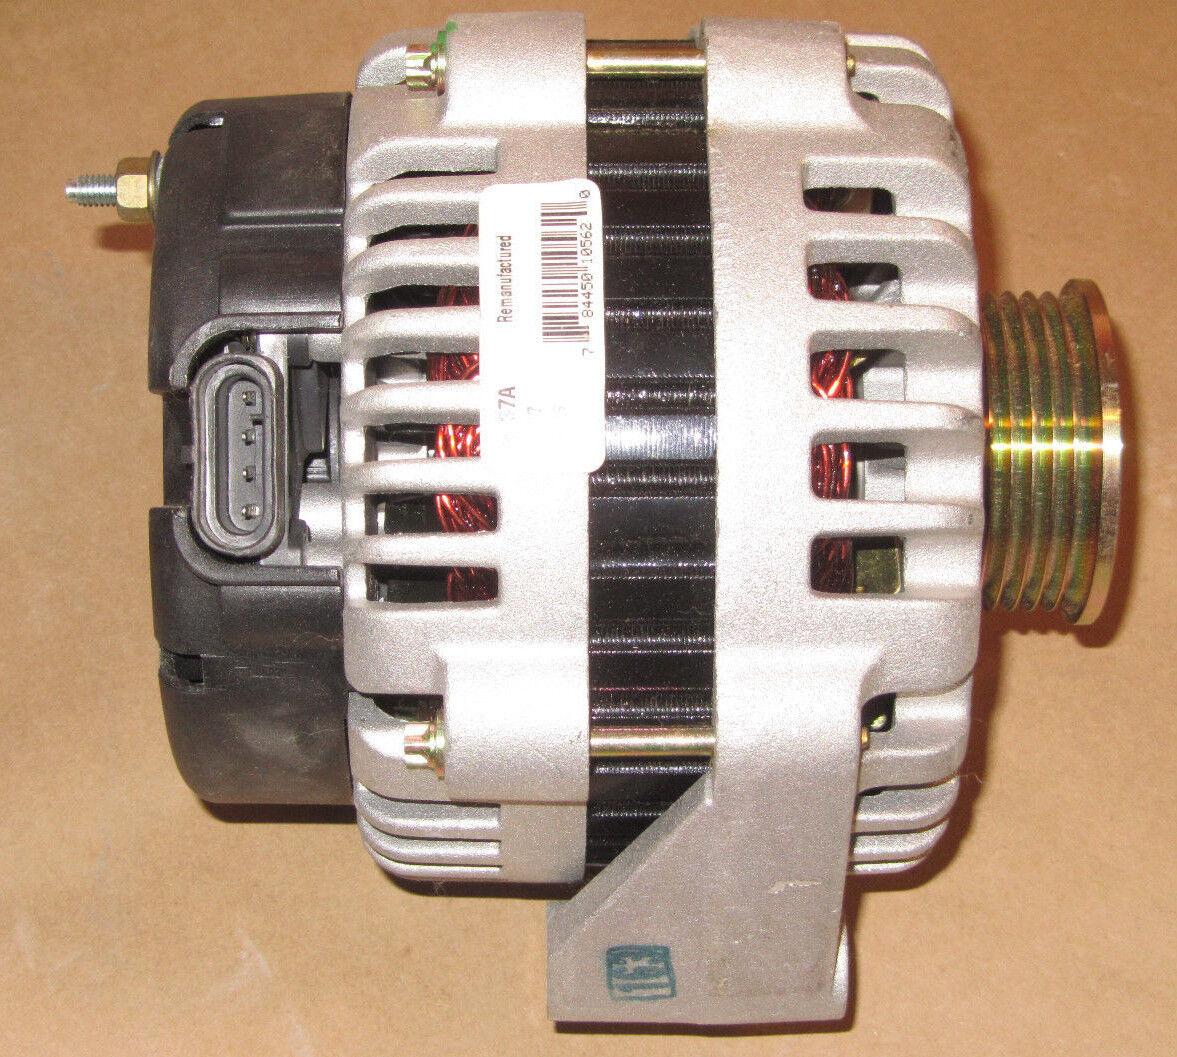 8237 ALTERNATOR CADILLAC AND GMC 5.3 //145 AMP//6-GROOVE PUL CHEVY SILVERADO 1500